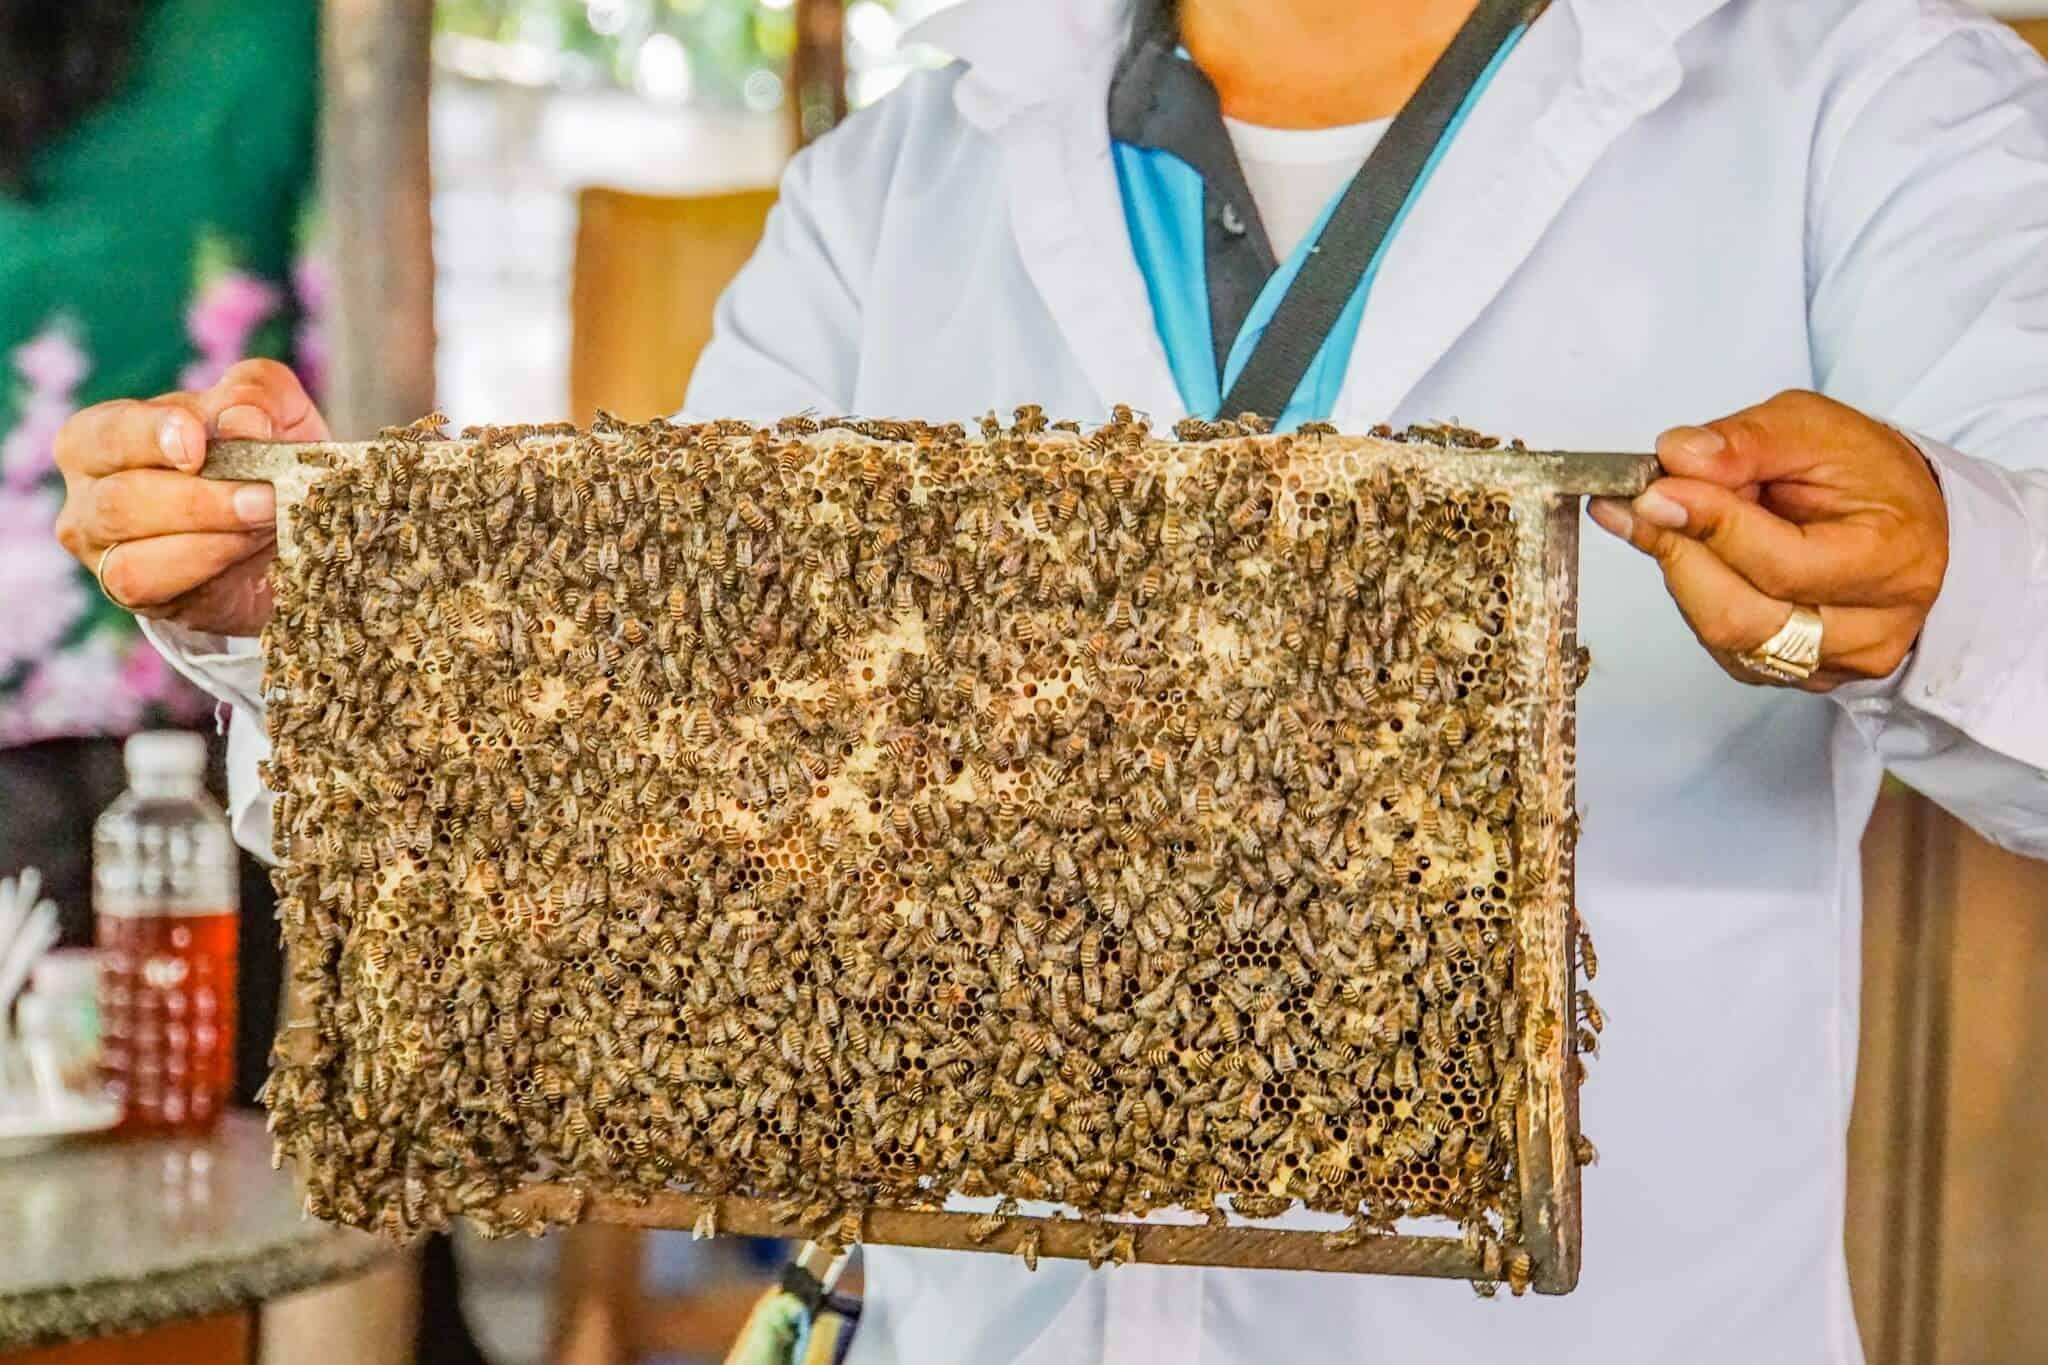 Mekong Delta Bees